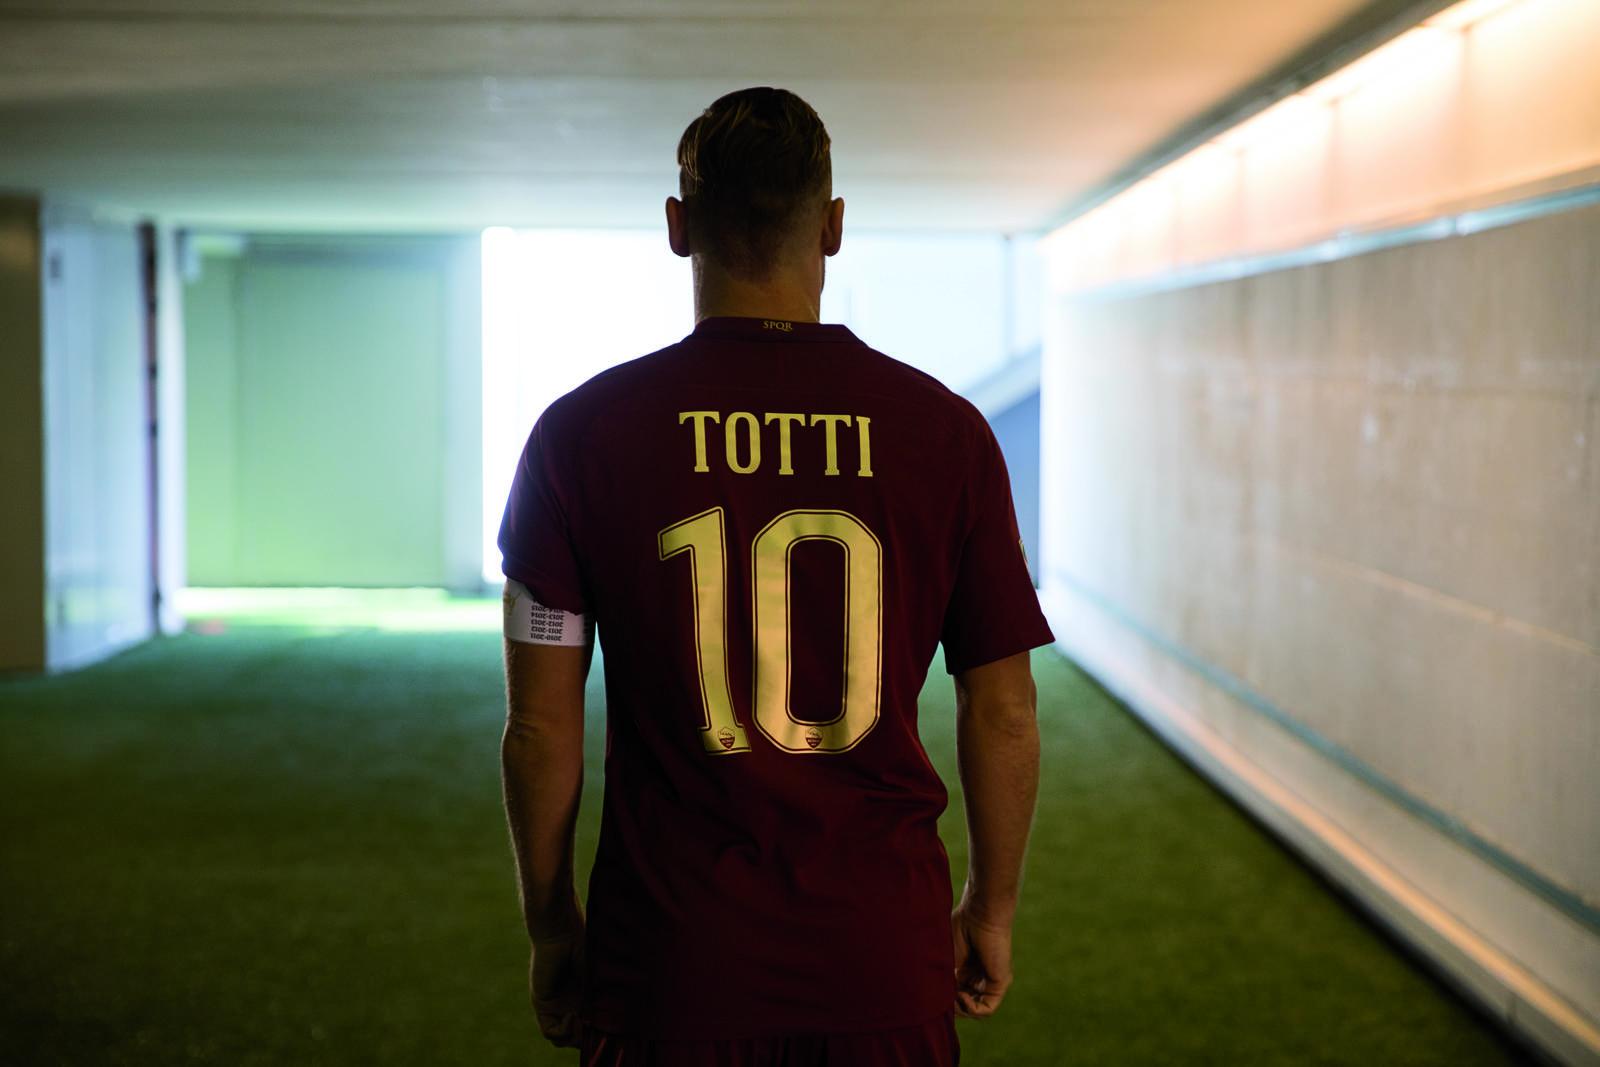 timeless design d815a e07d3 AS Roma Derby kit 2016-17 - Nike News